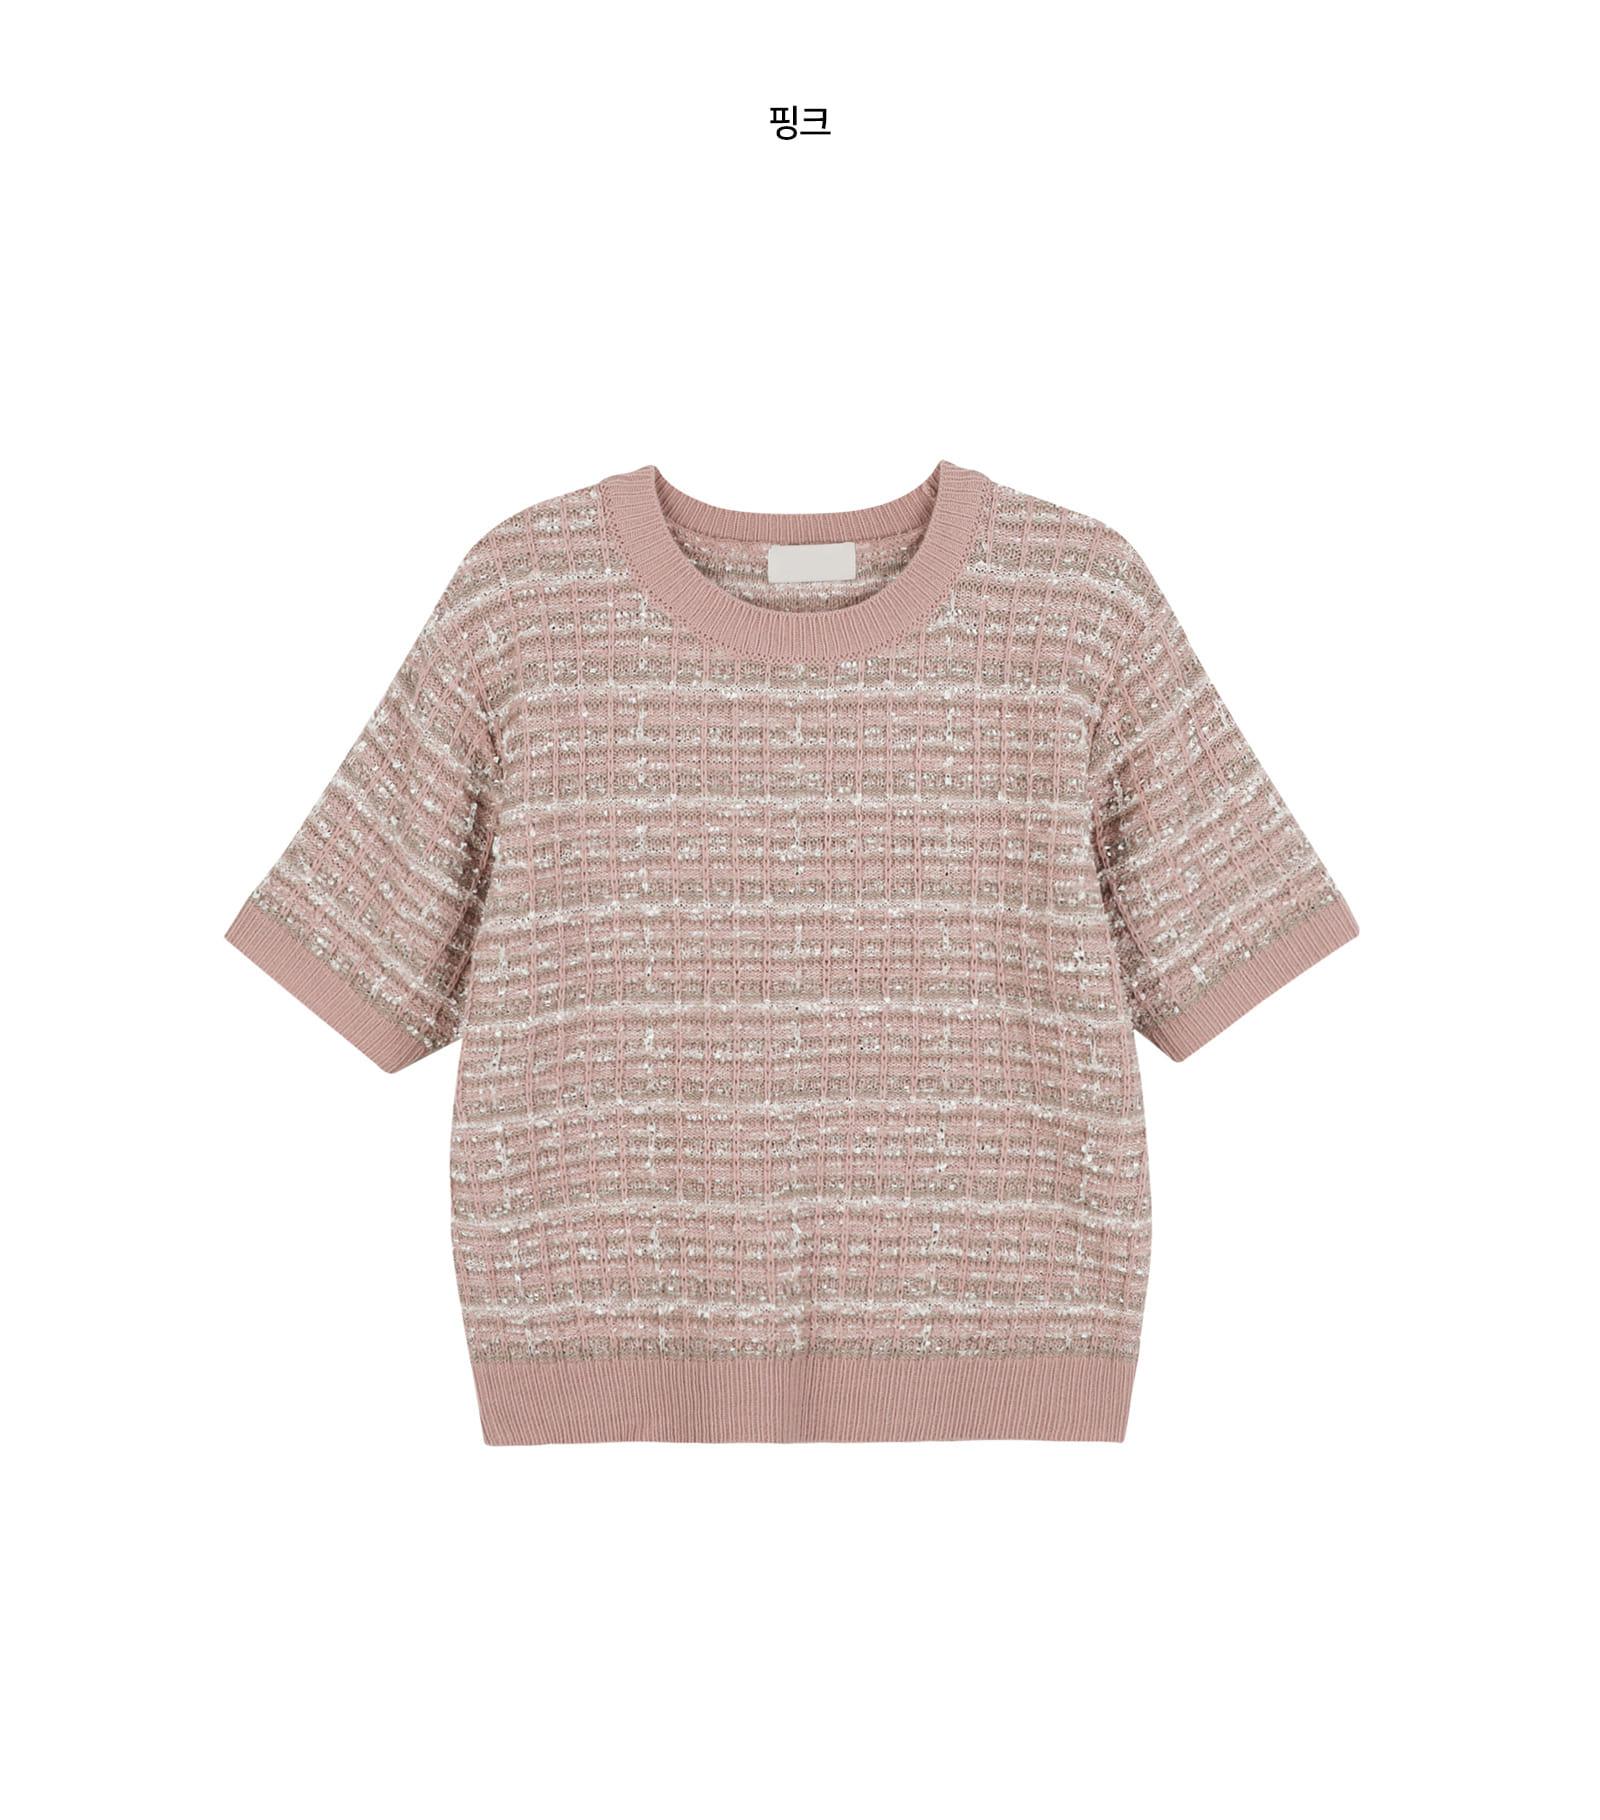 Coco Tweed Color Line Puff Knit